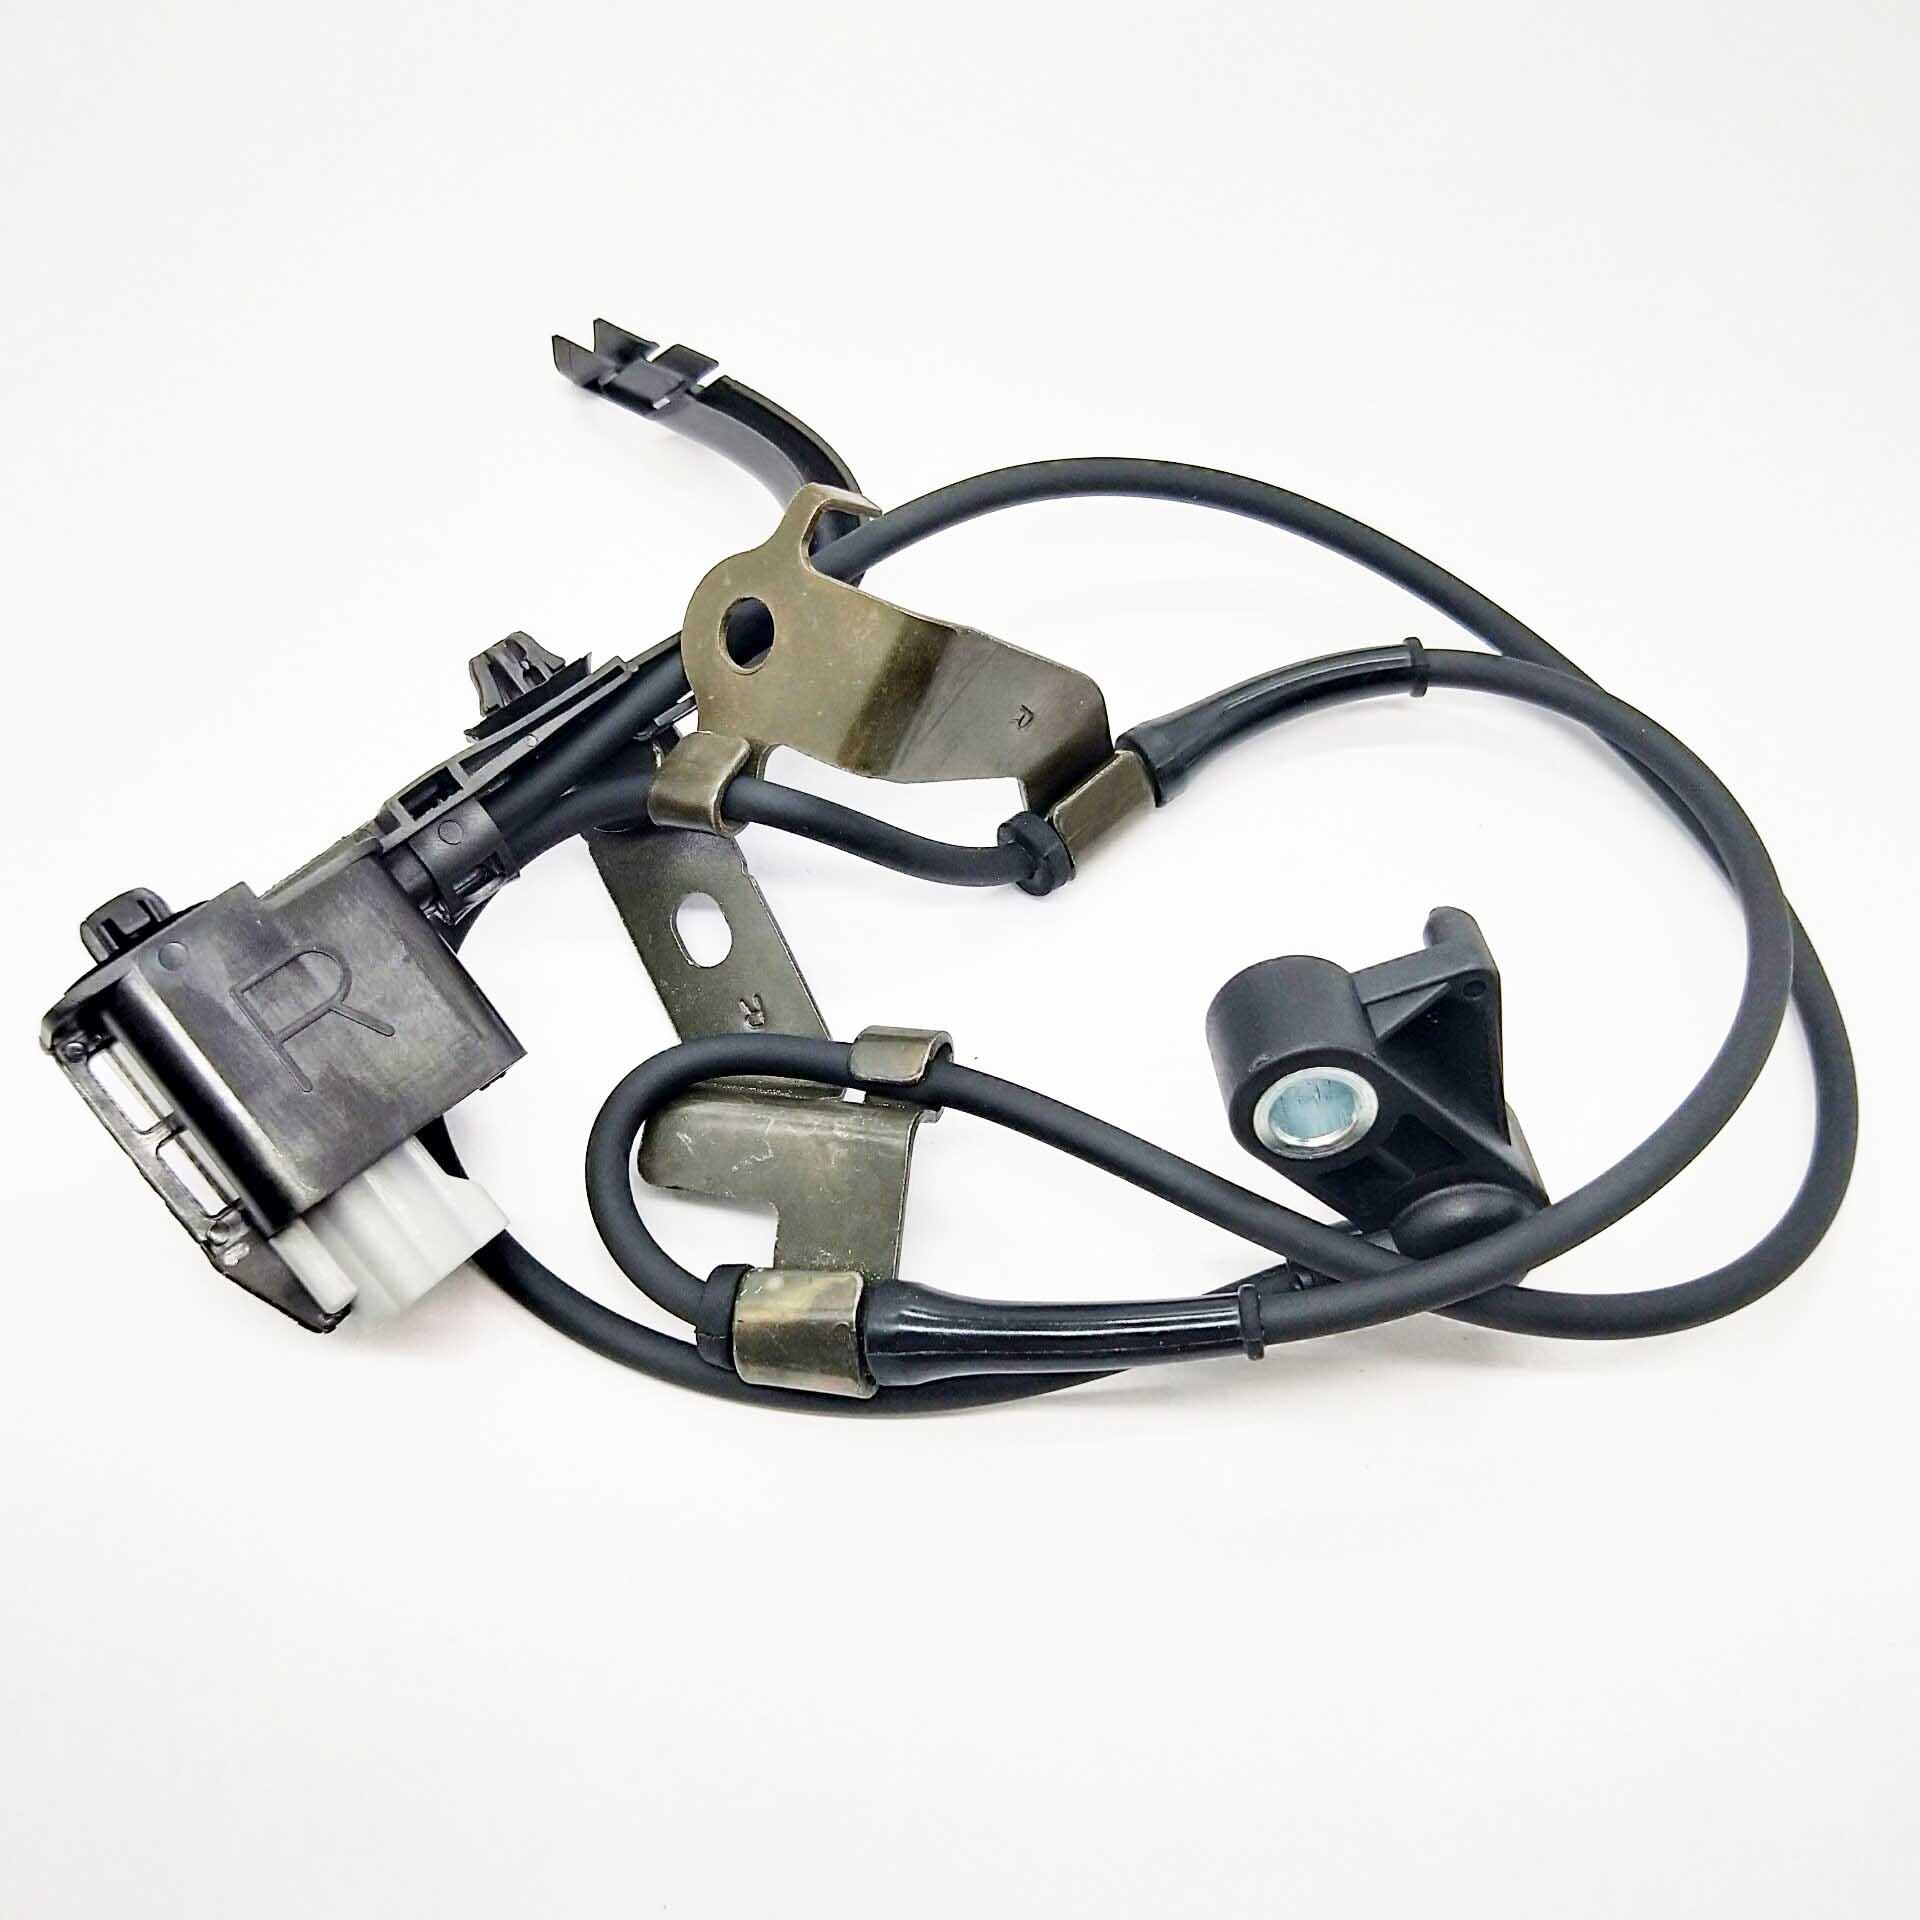 SMD GJ6A-43-70XB Top Front Right  Anti-Skid Brake Sensor ABS Wheel Speed Sensor  GJ6A4370XB  For Mazda 6 1.8 2.0 2.3